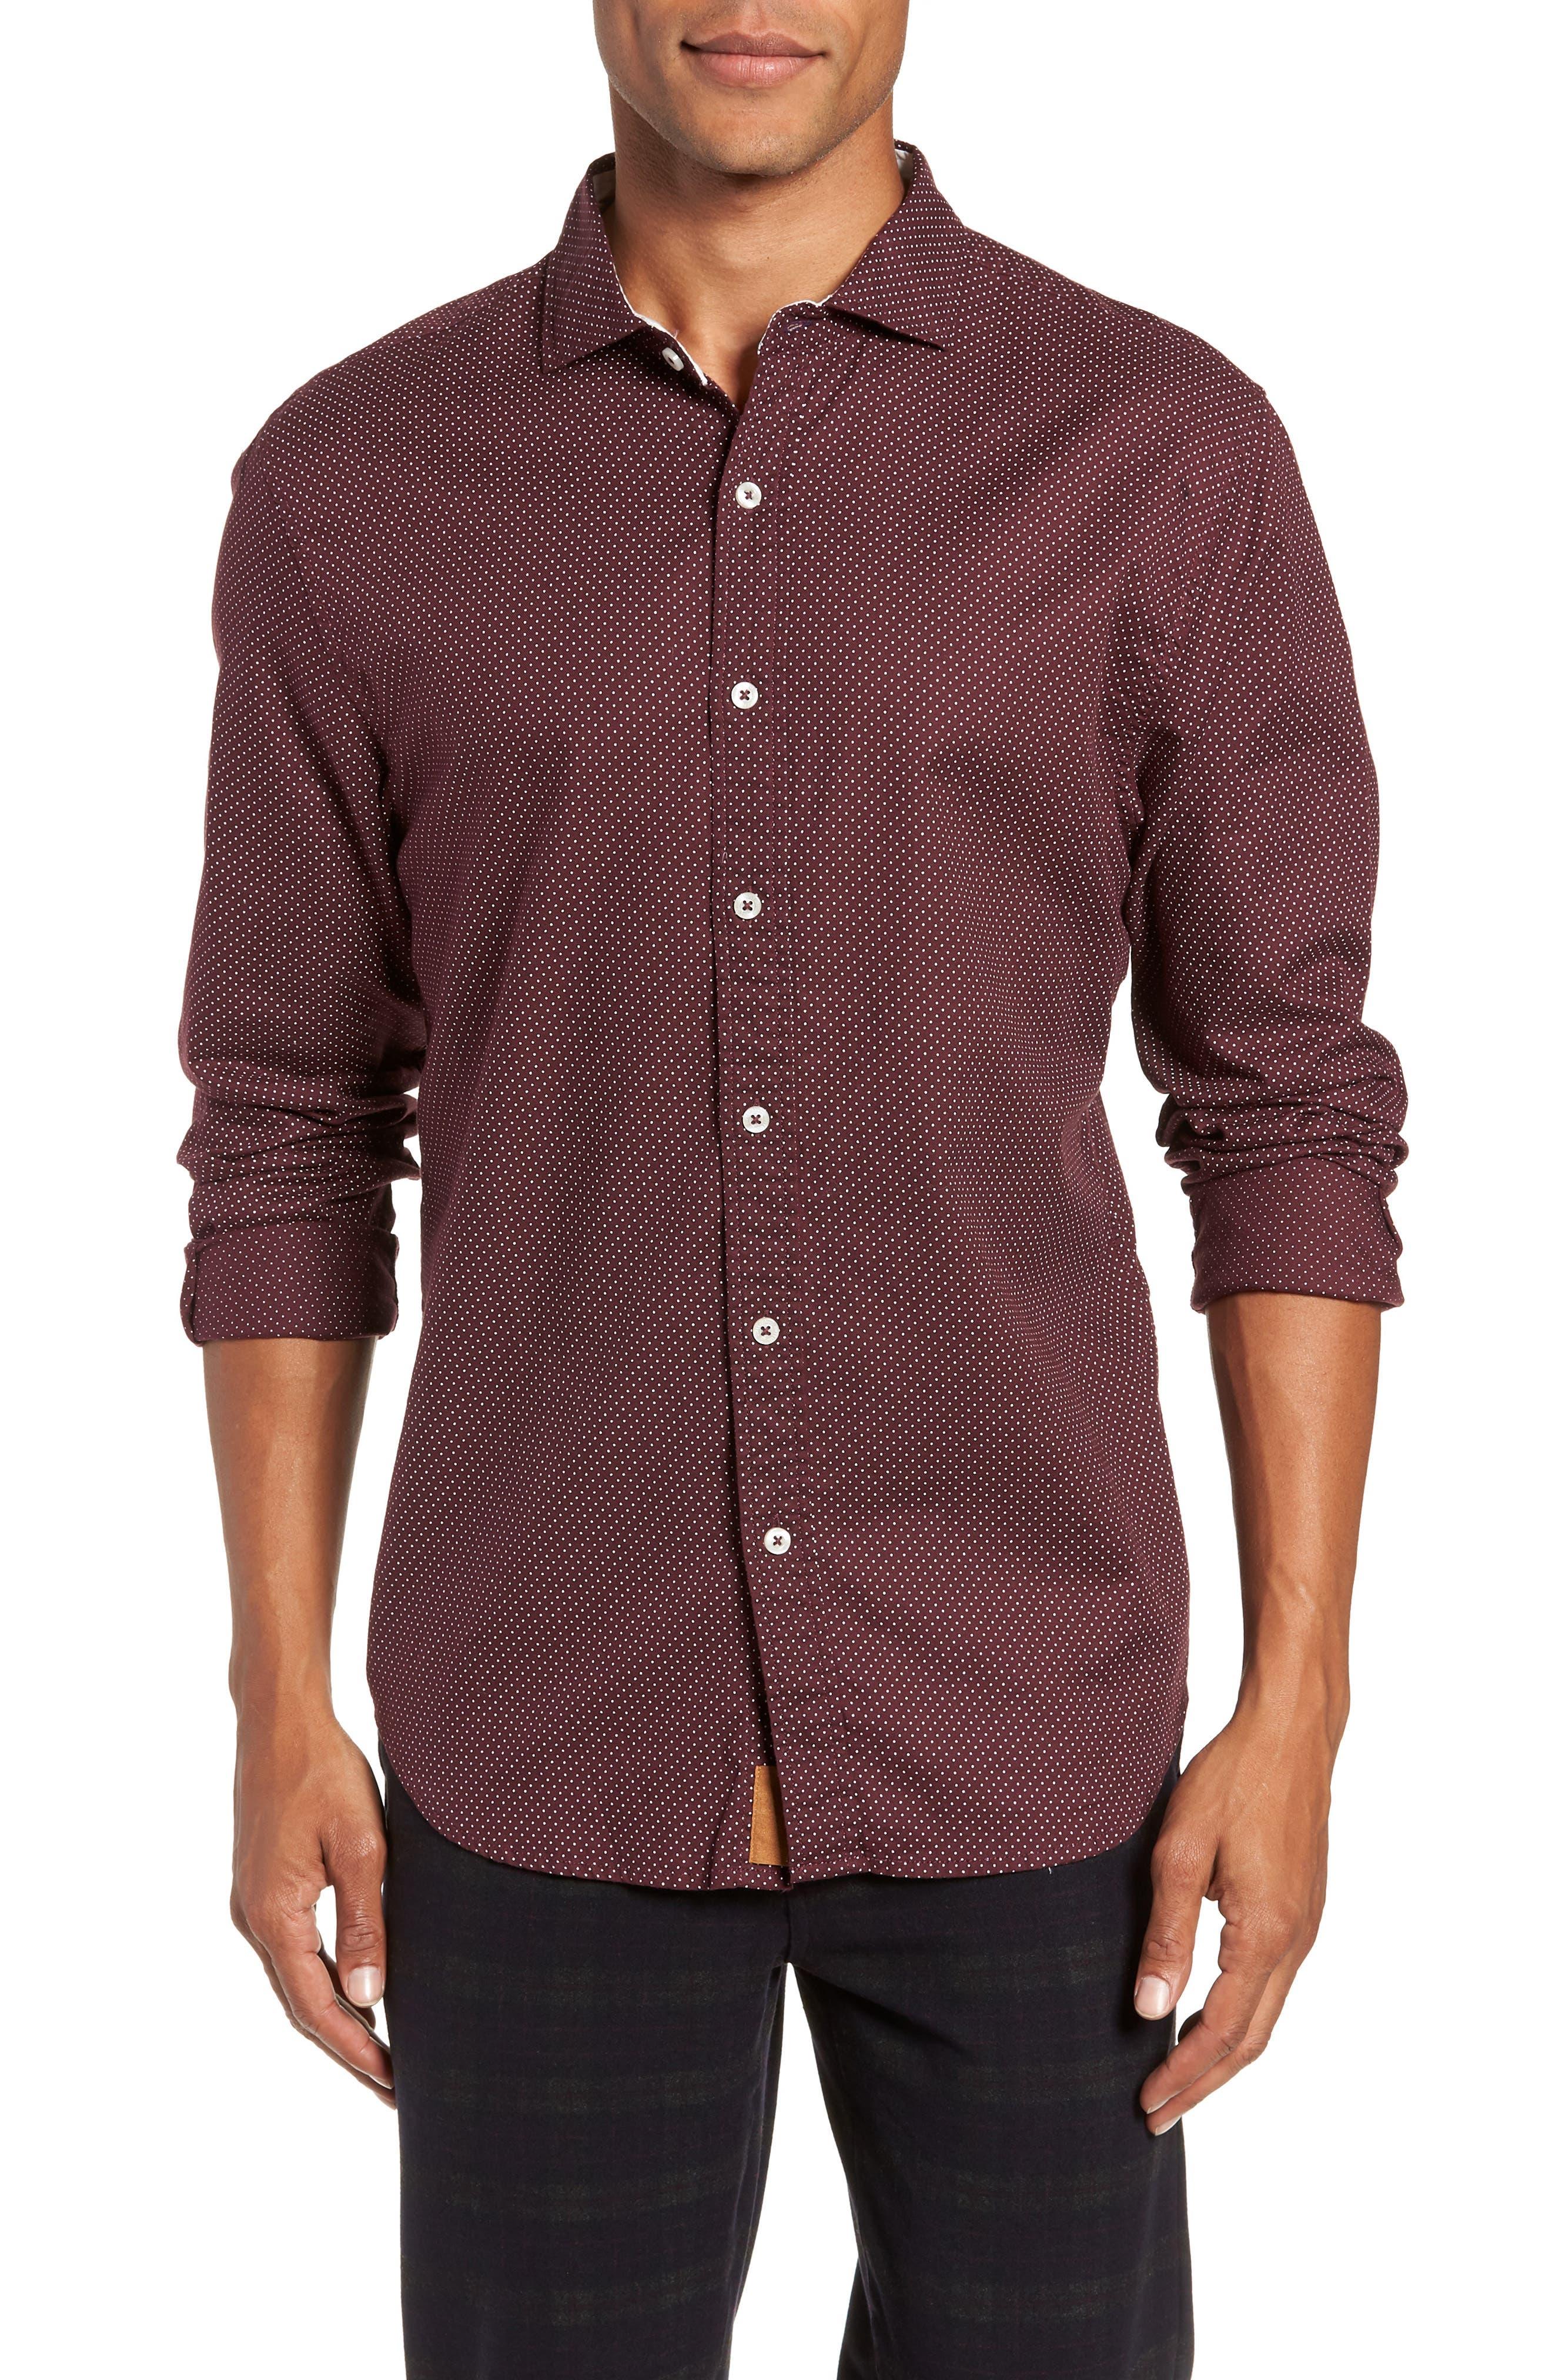 Earnest Regular Fit Dotted Sport Shirt,                         Main,                         color, BURGUNDY